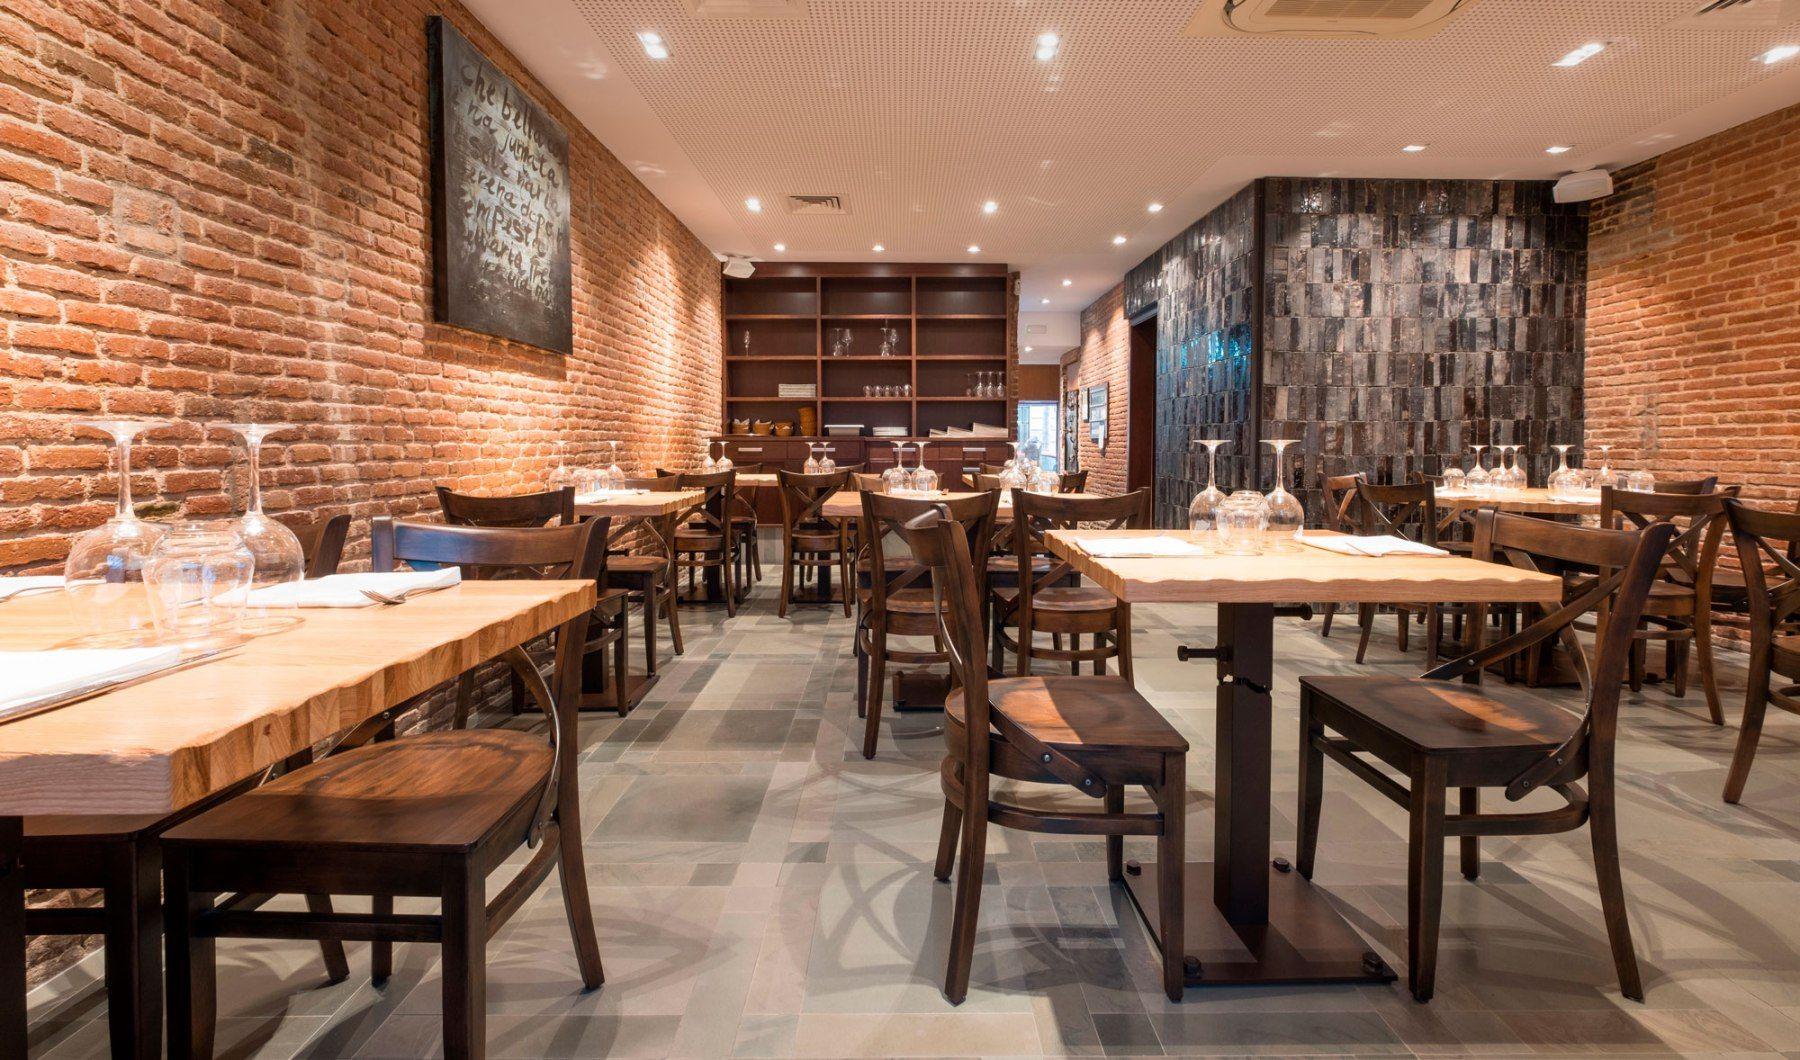 Cafeteria Eroski Centro Comercial Bilbondo Mobiliario De Verges 2  # Muebles Nicolau